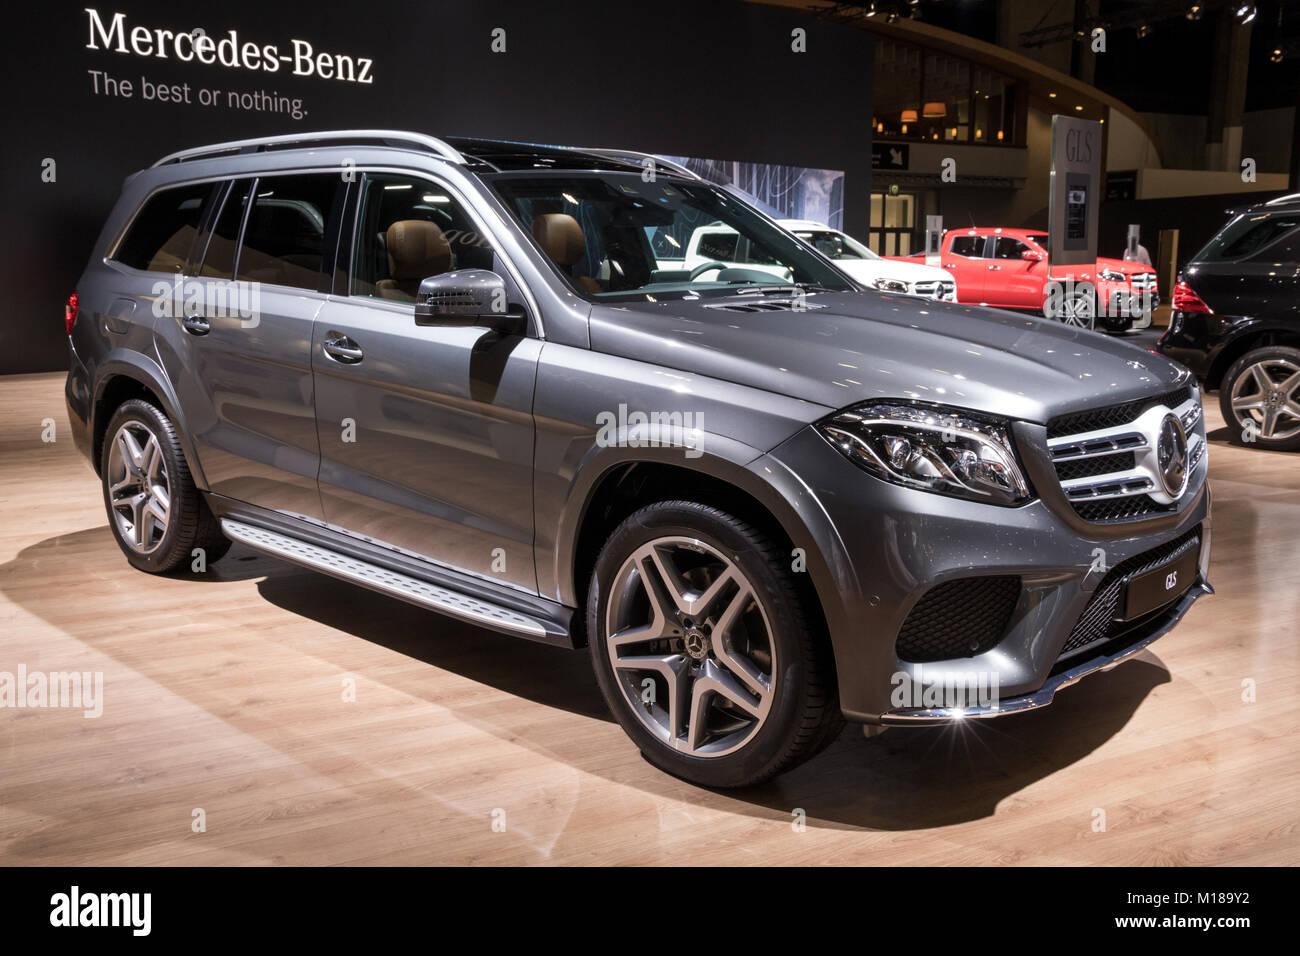 Brussels Jan 10 2018 Mercedes Benz Gls Full Size Luxury Suv Car Stock Photo Alamy